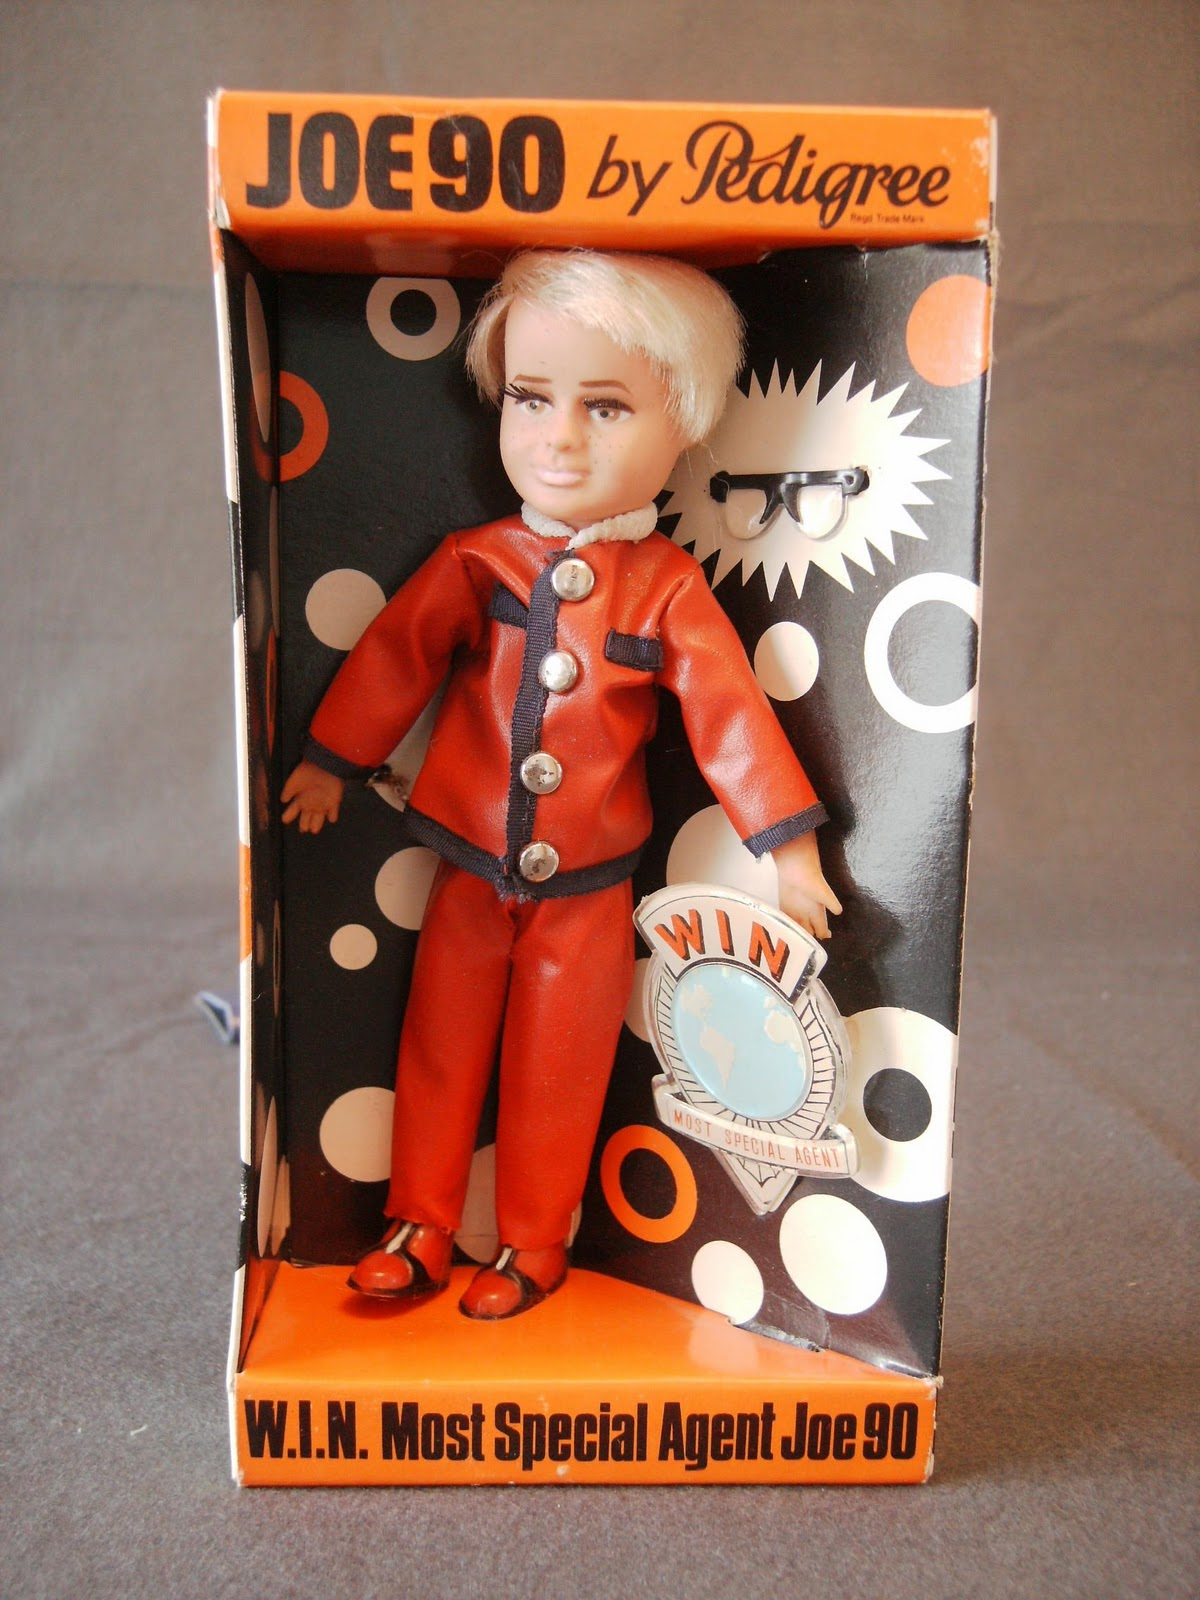 http://2.bp.blogspot.com/_RsCCizsWvNw/TKQ7bqWZZ1I/AAAAAAAALAI/ukJQFfRz_BU/s1600/jim+joe+90+doll.jpg